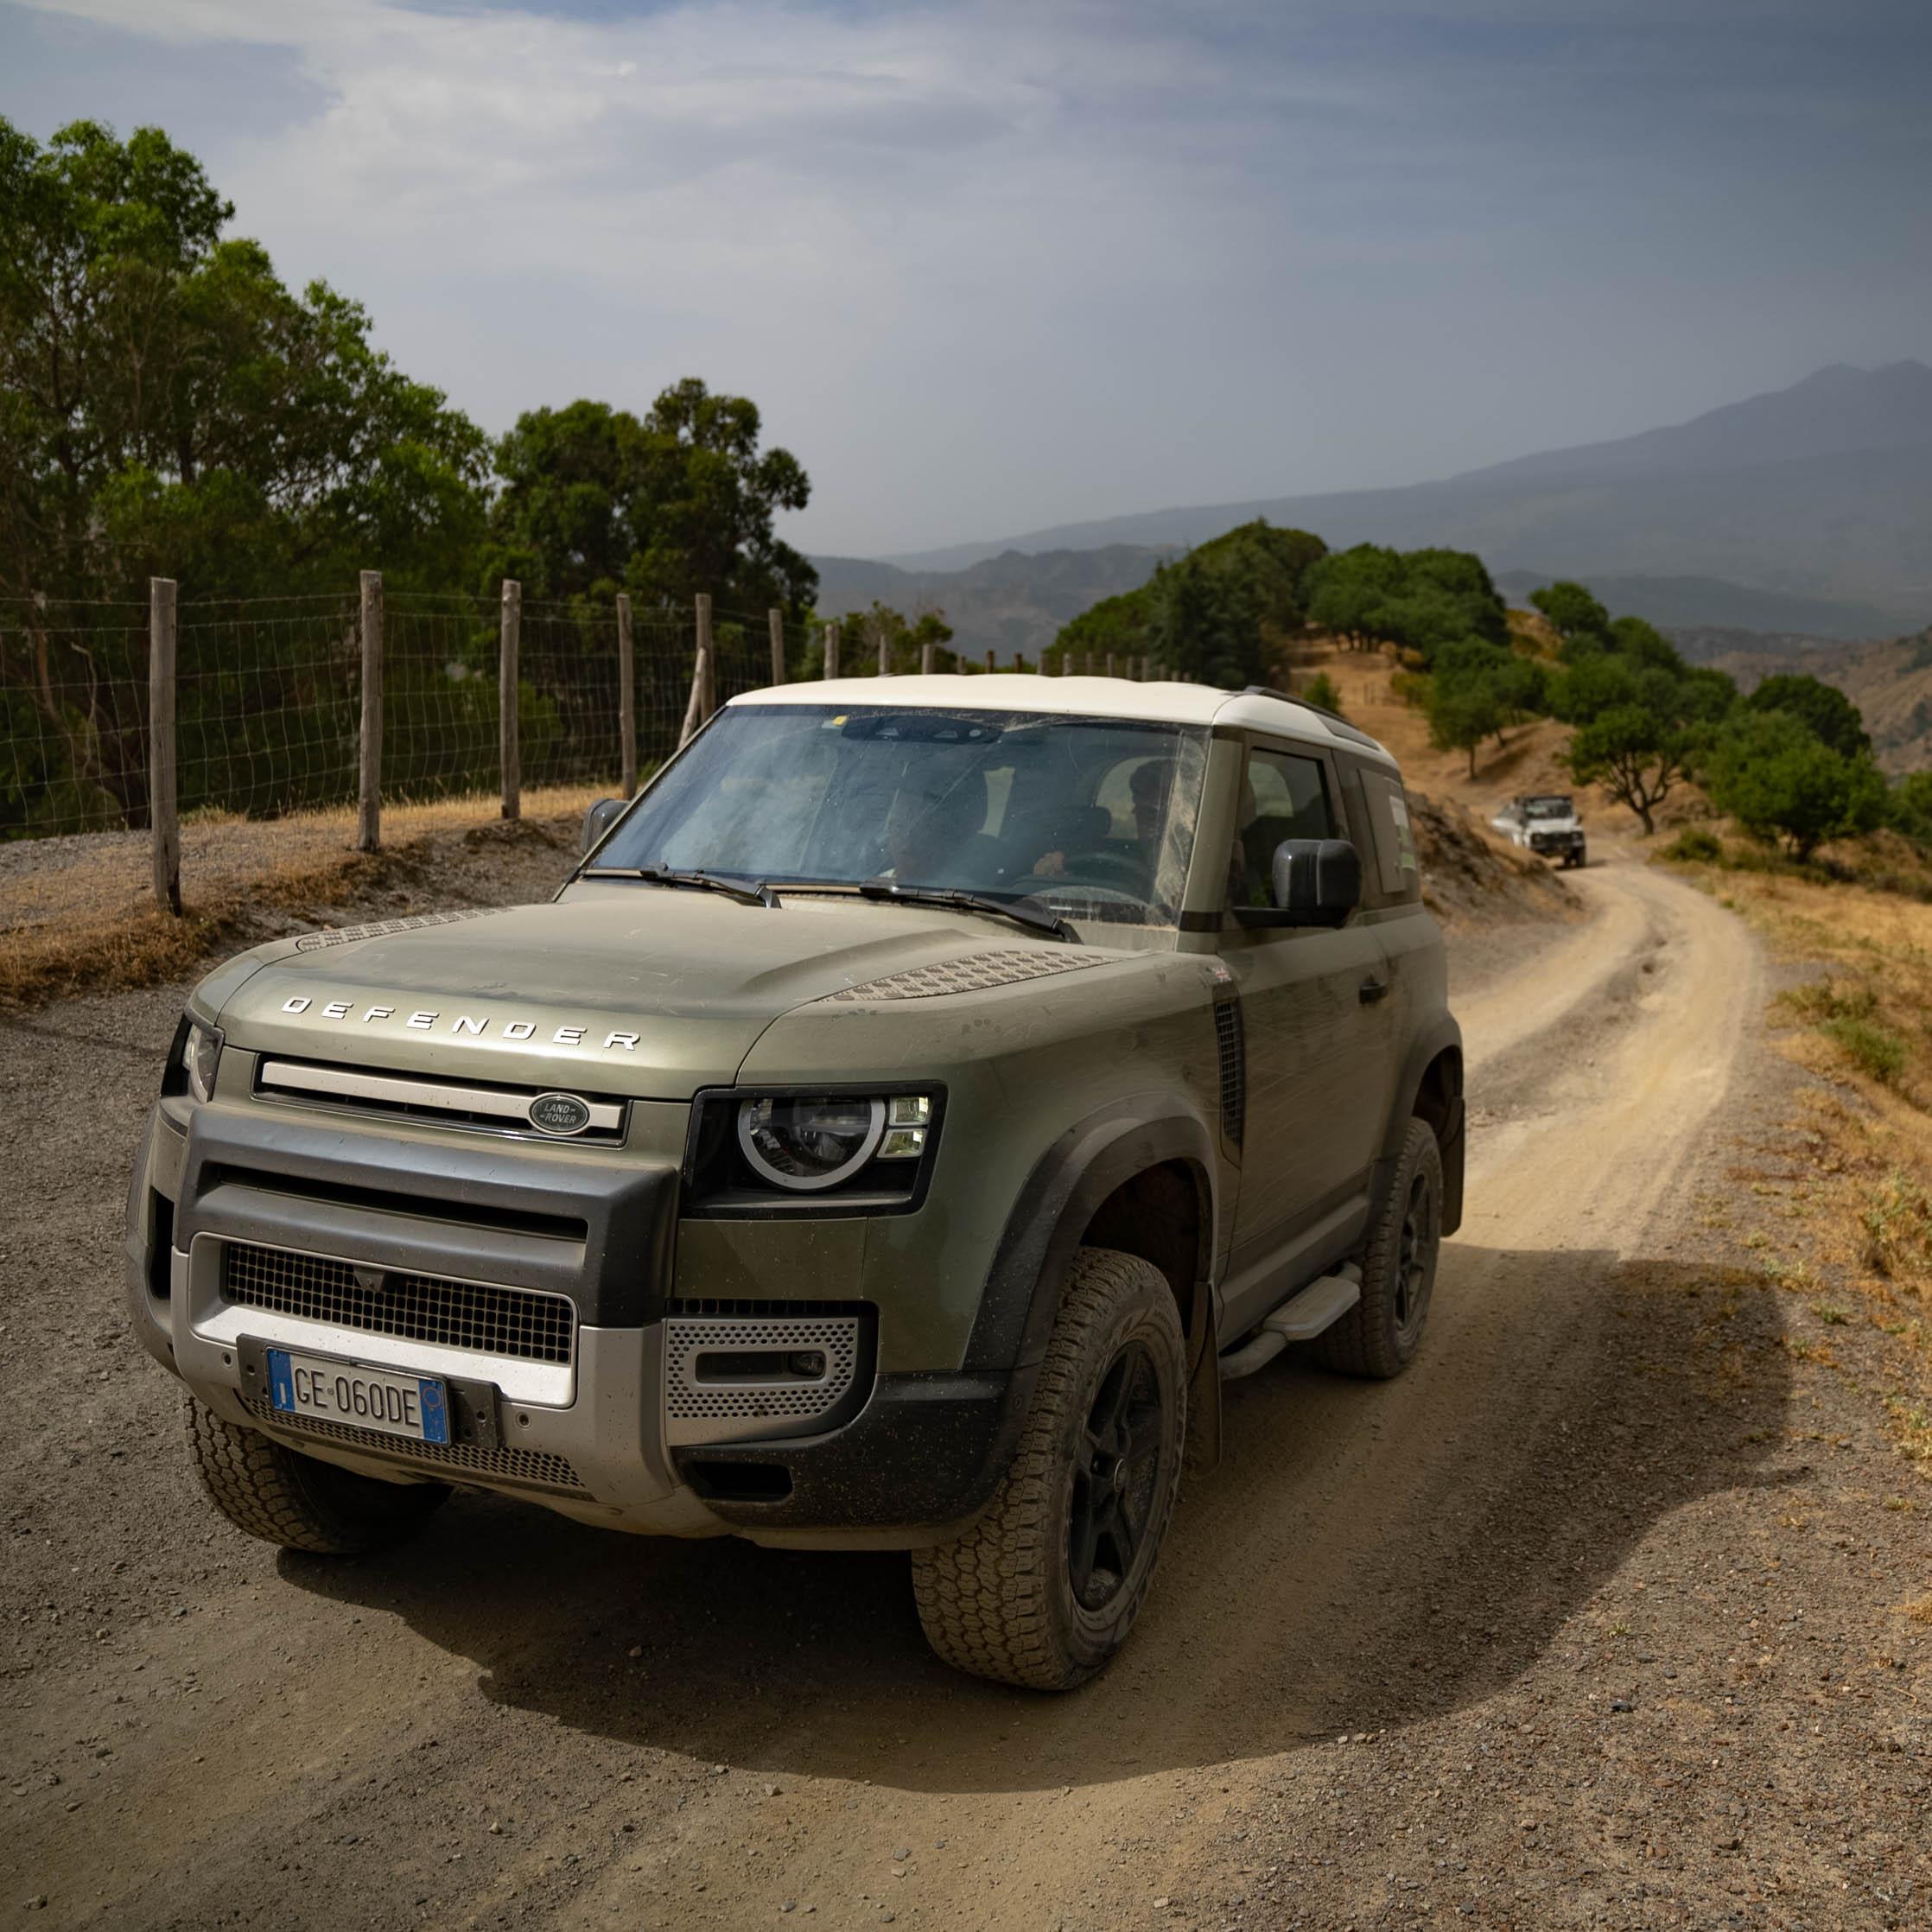 Land_Rover_Tour_Sicilia_2021_Land_Rover_Experience_Italia_-13